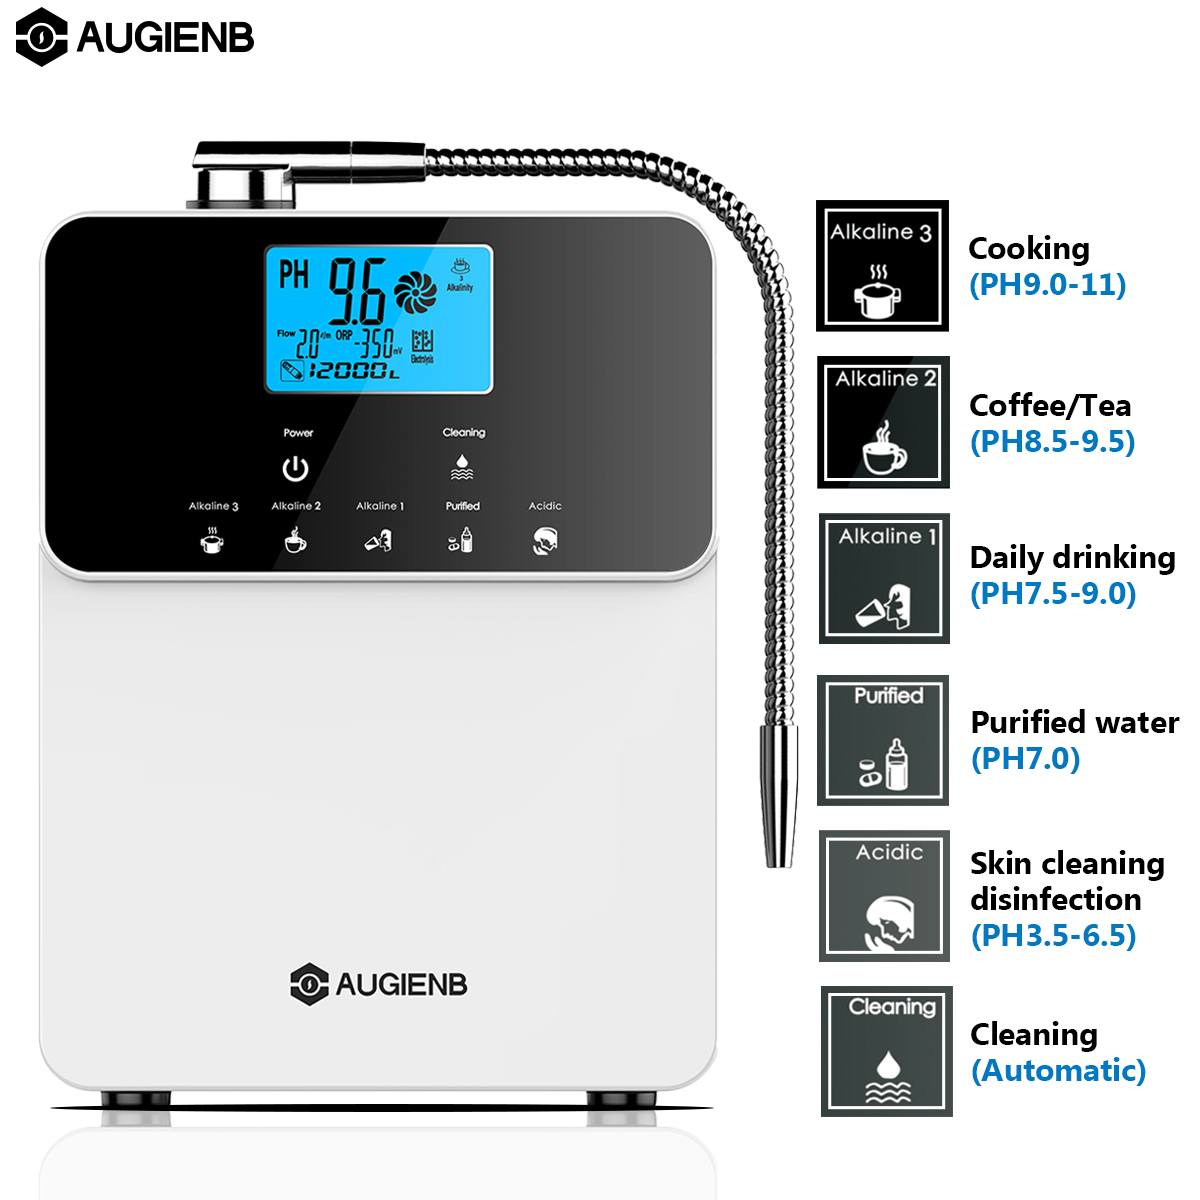 AUGIENB LCD Water Ionizer Purifier Machine PH 3.5-11 Alkaline Acid 5 Water Settings 12000 Liters Auto-Cleaning Water Filter